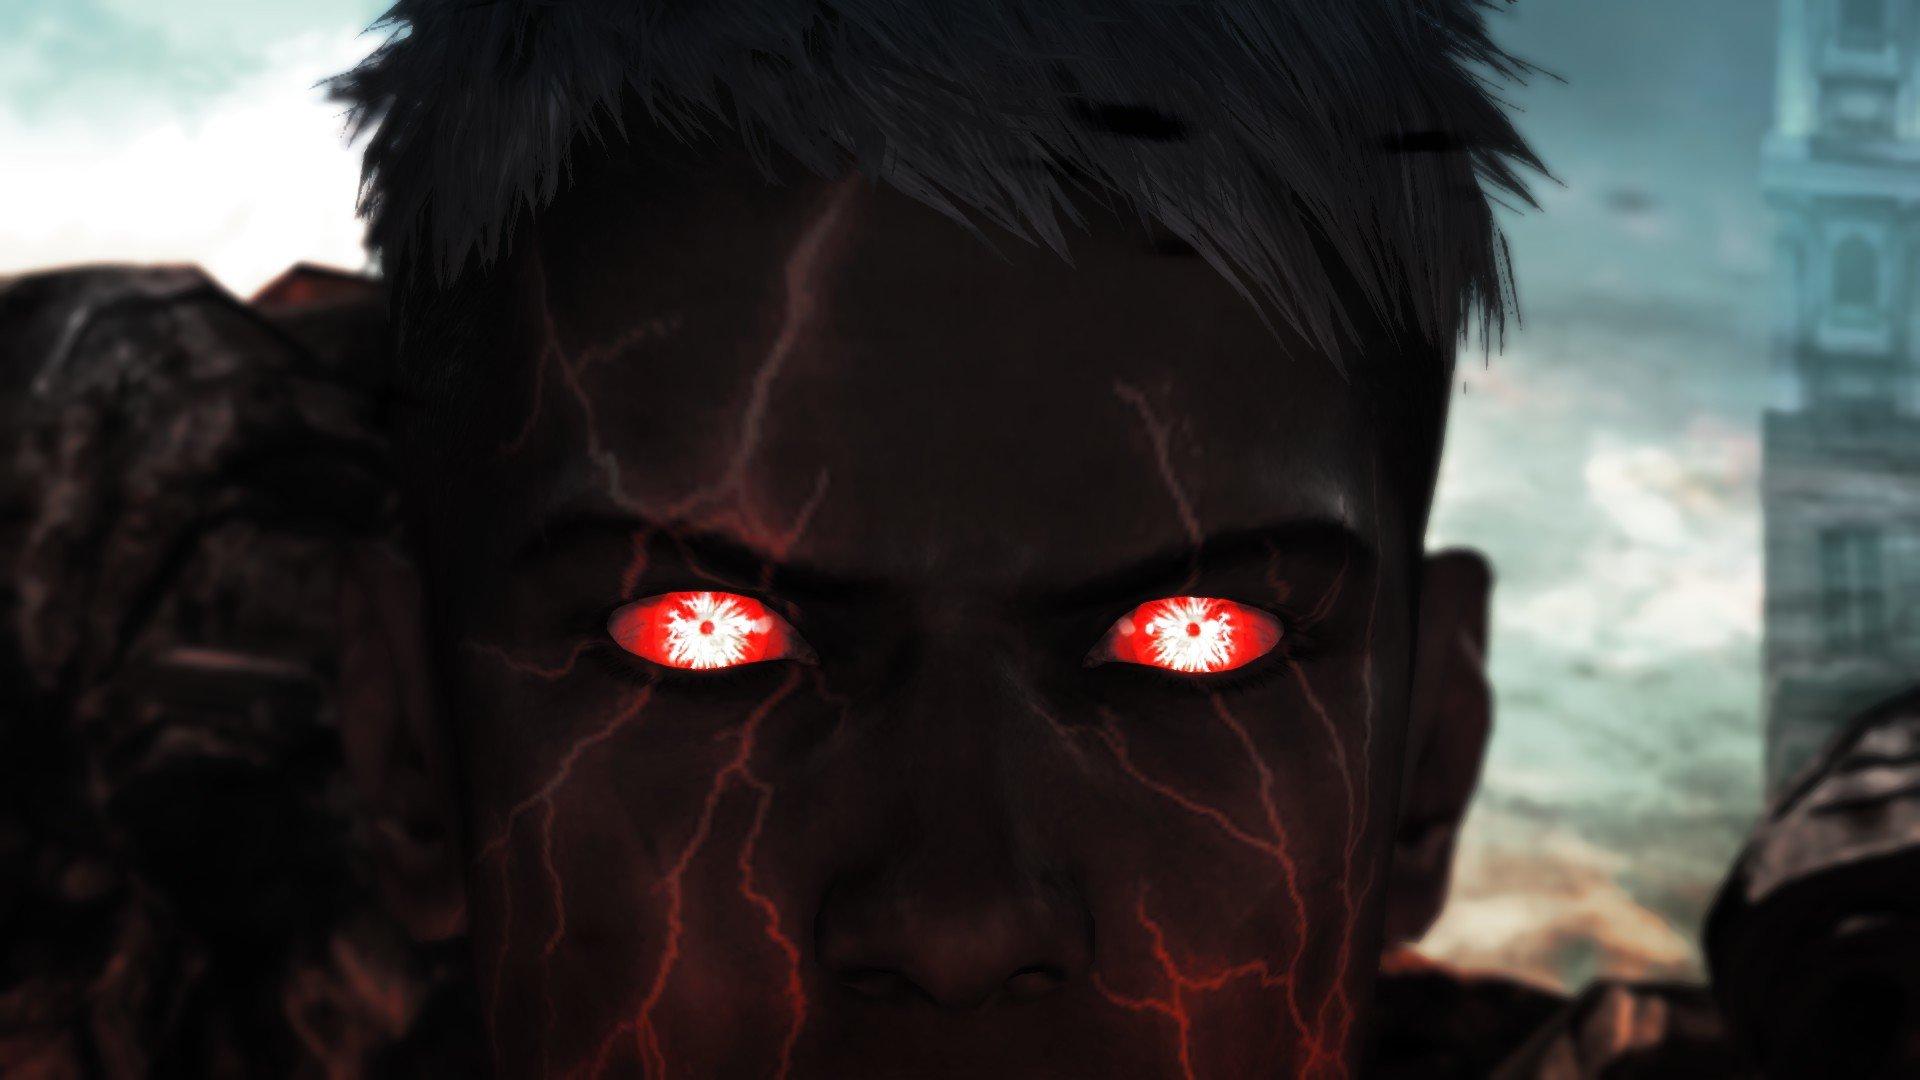 Free Download Dante Devil May Cry Wallpaper Id120913 Hd 1920x1080